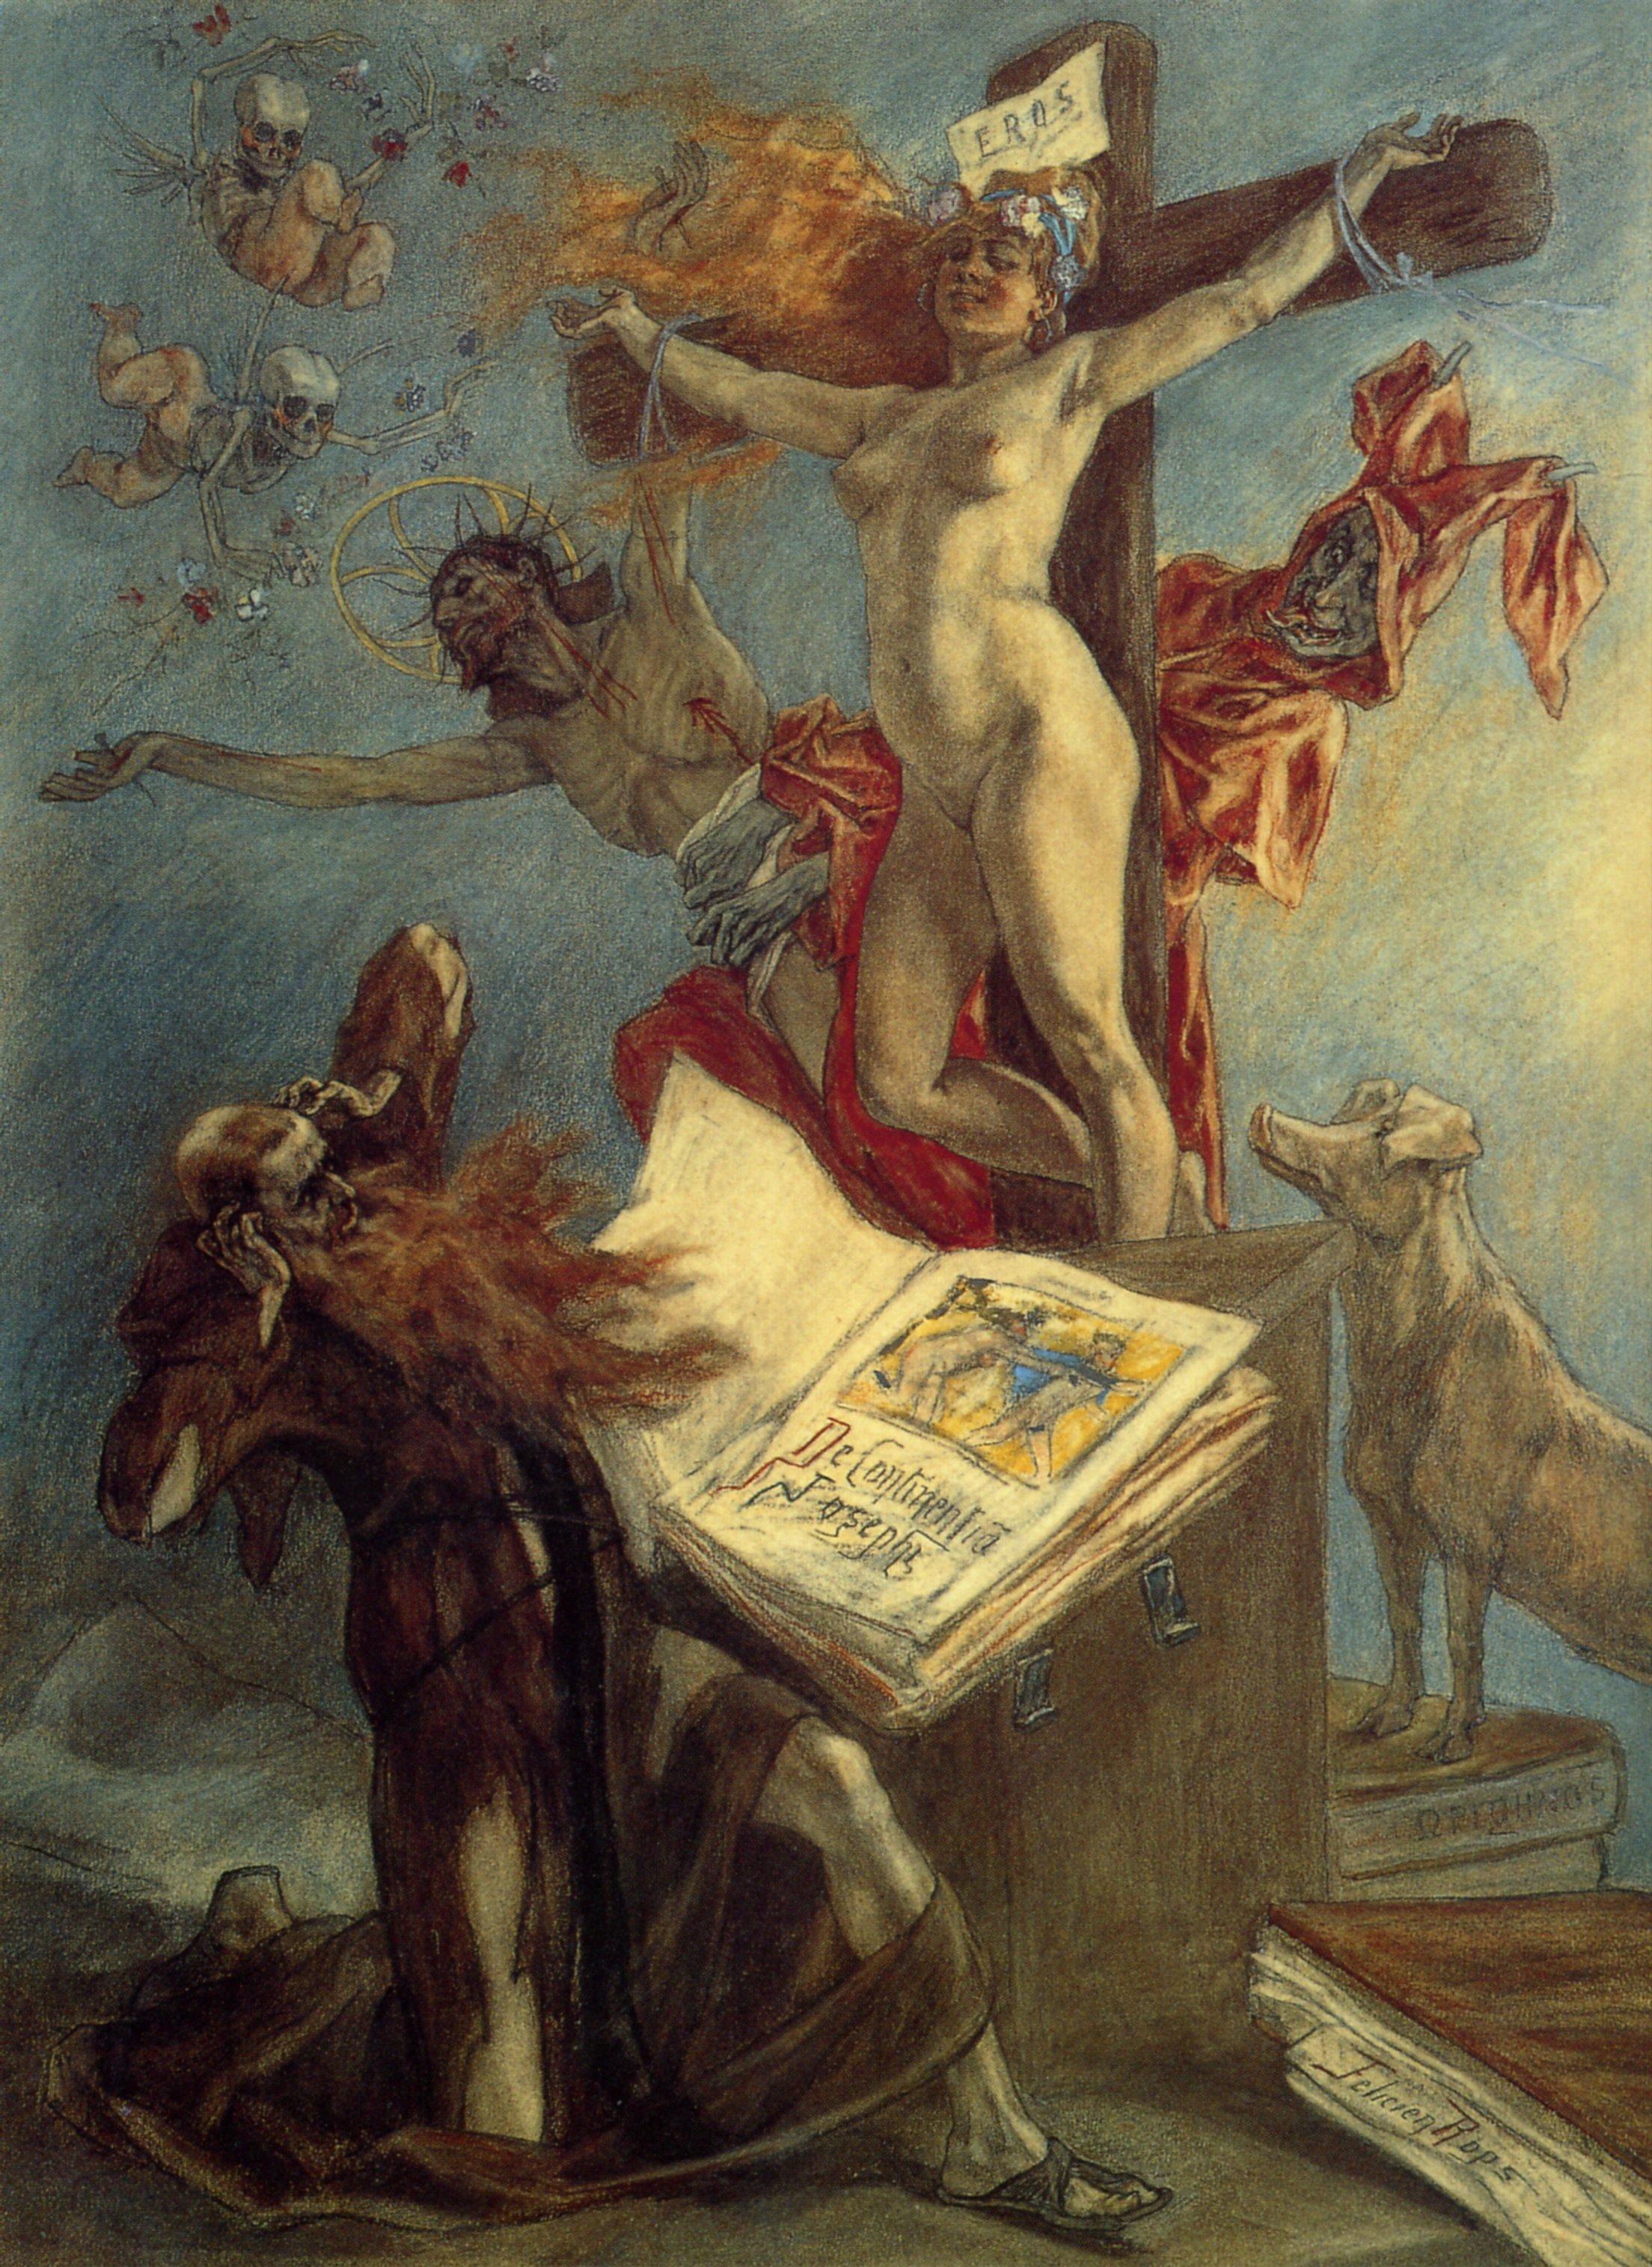 http://upload.wikimedia.org/wikipedia/commons/a/a0/F%C3%A9licien_Rops_-_La_tentation_de_Saint_Antoine.jpg